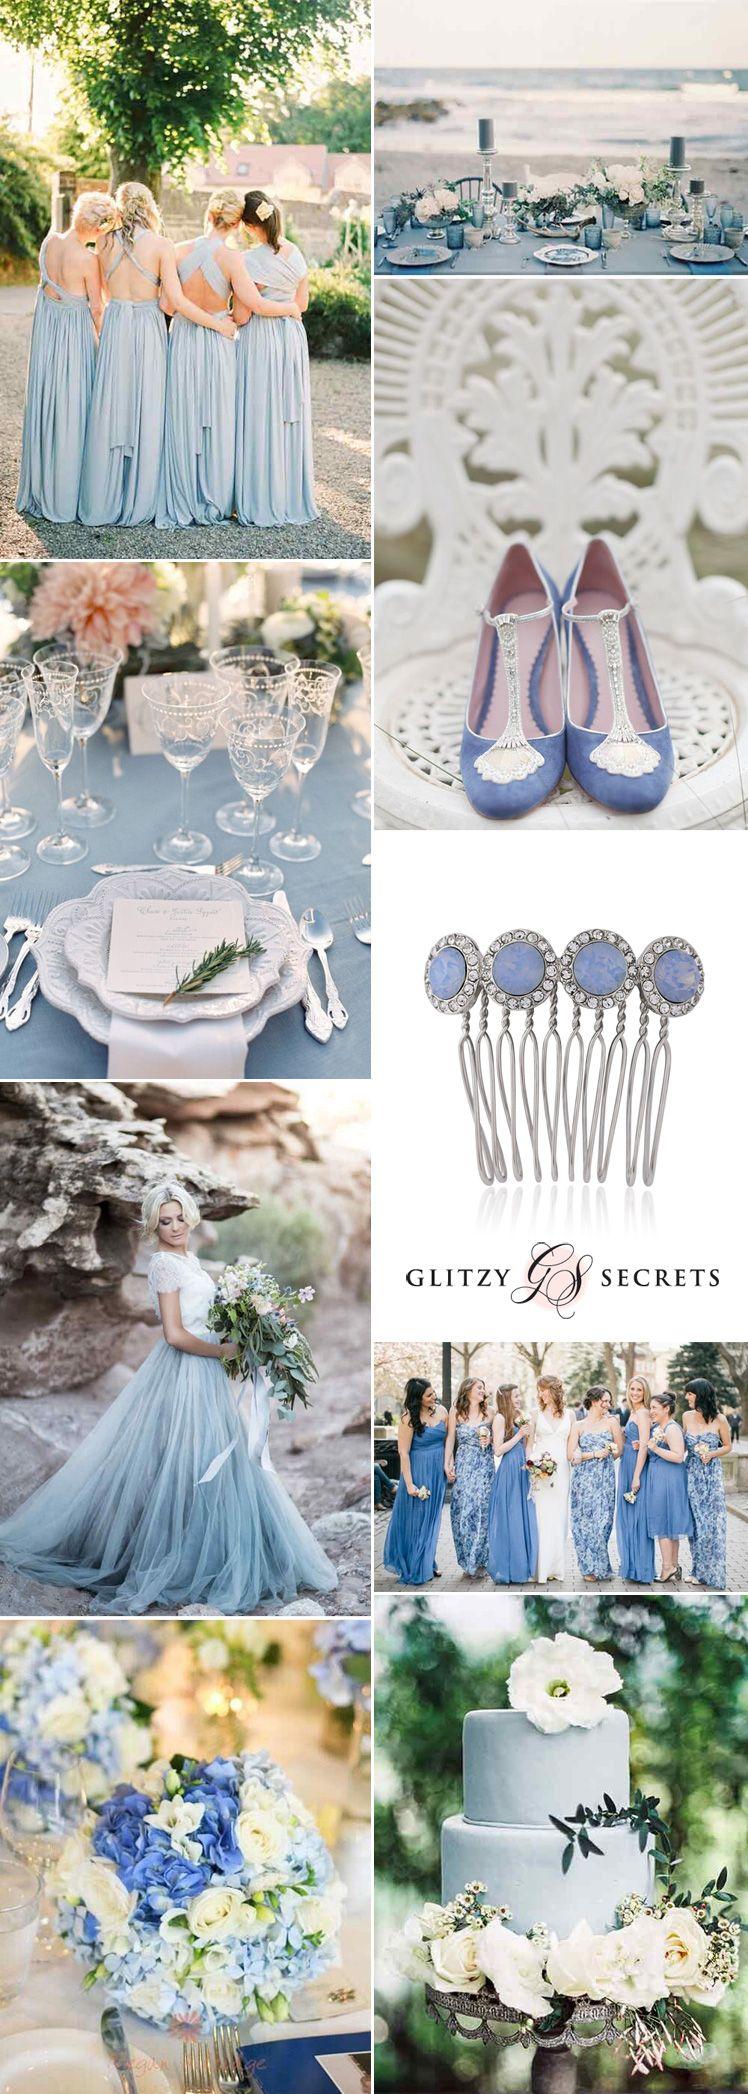 Light blue wedding decoration ideas  Dreamy Wedgwood Blue Wedding Ideas  Trend and Color palette